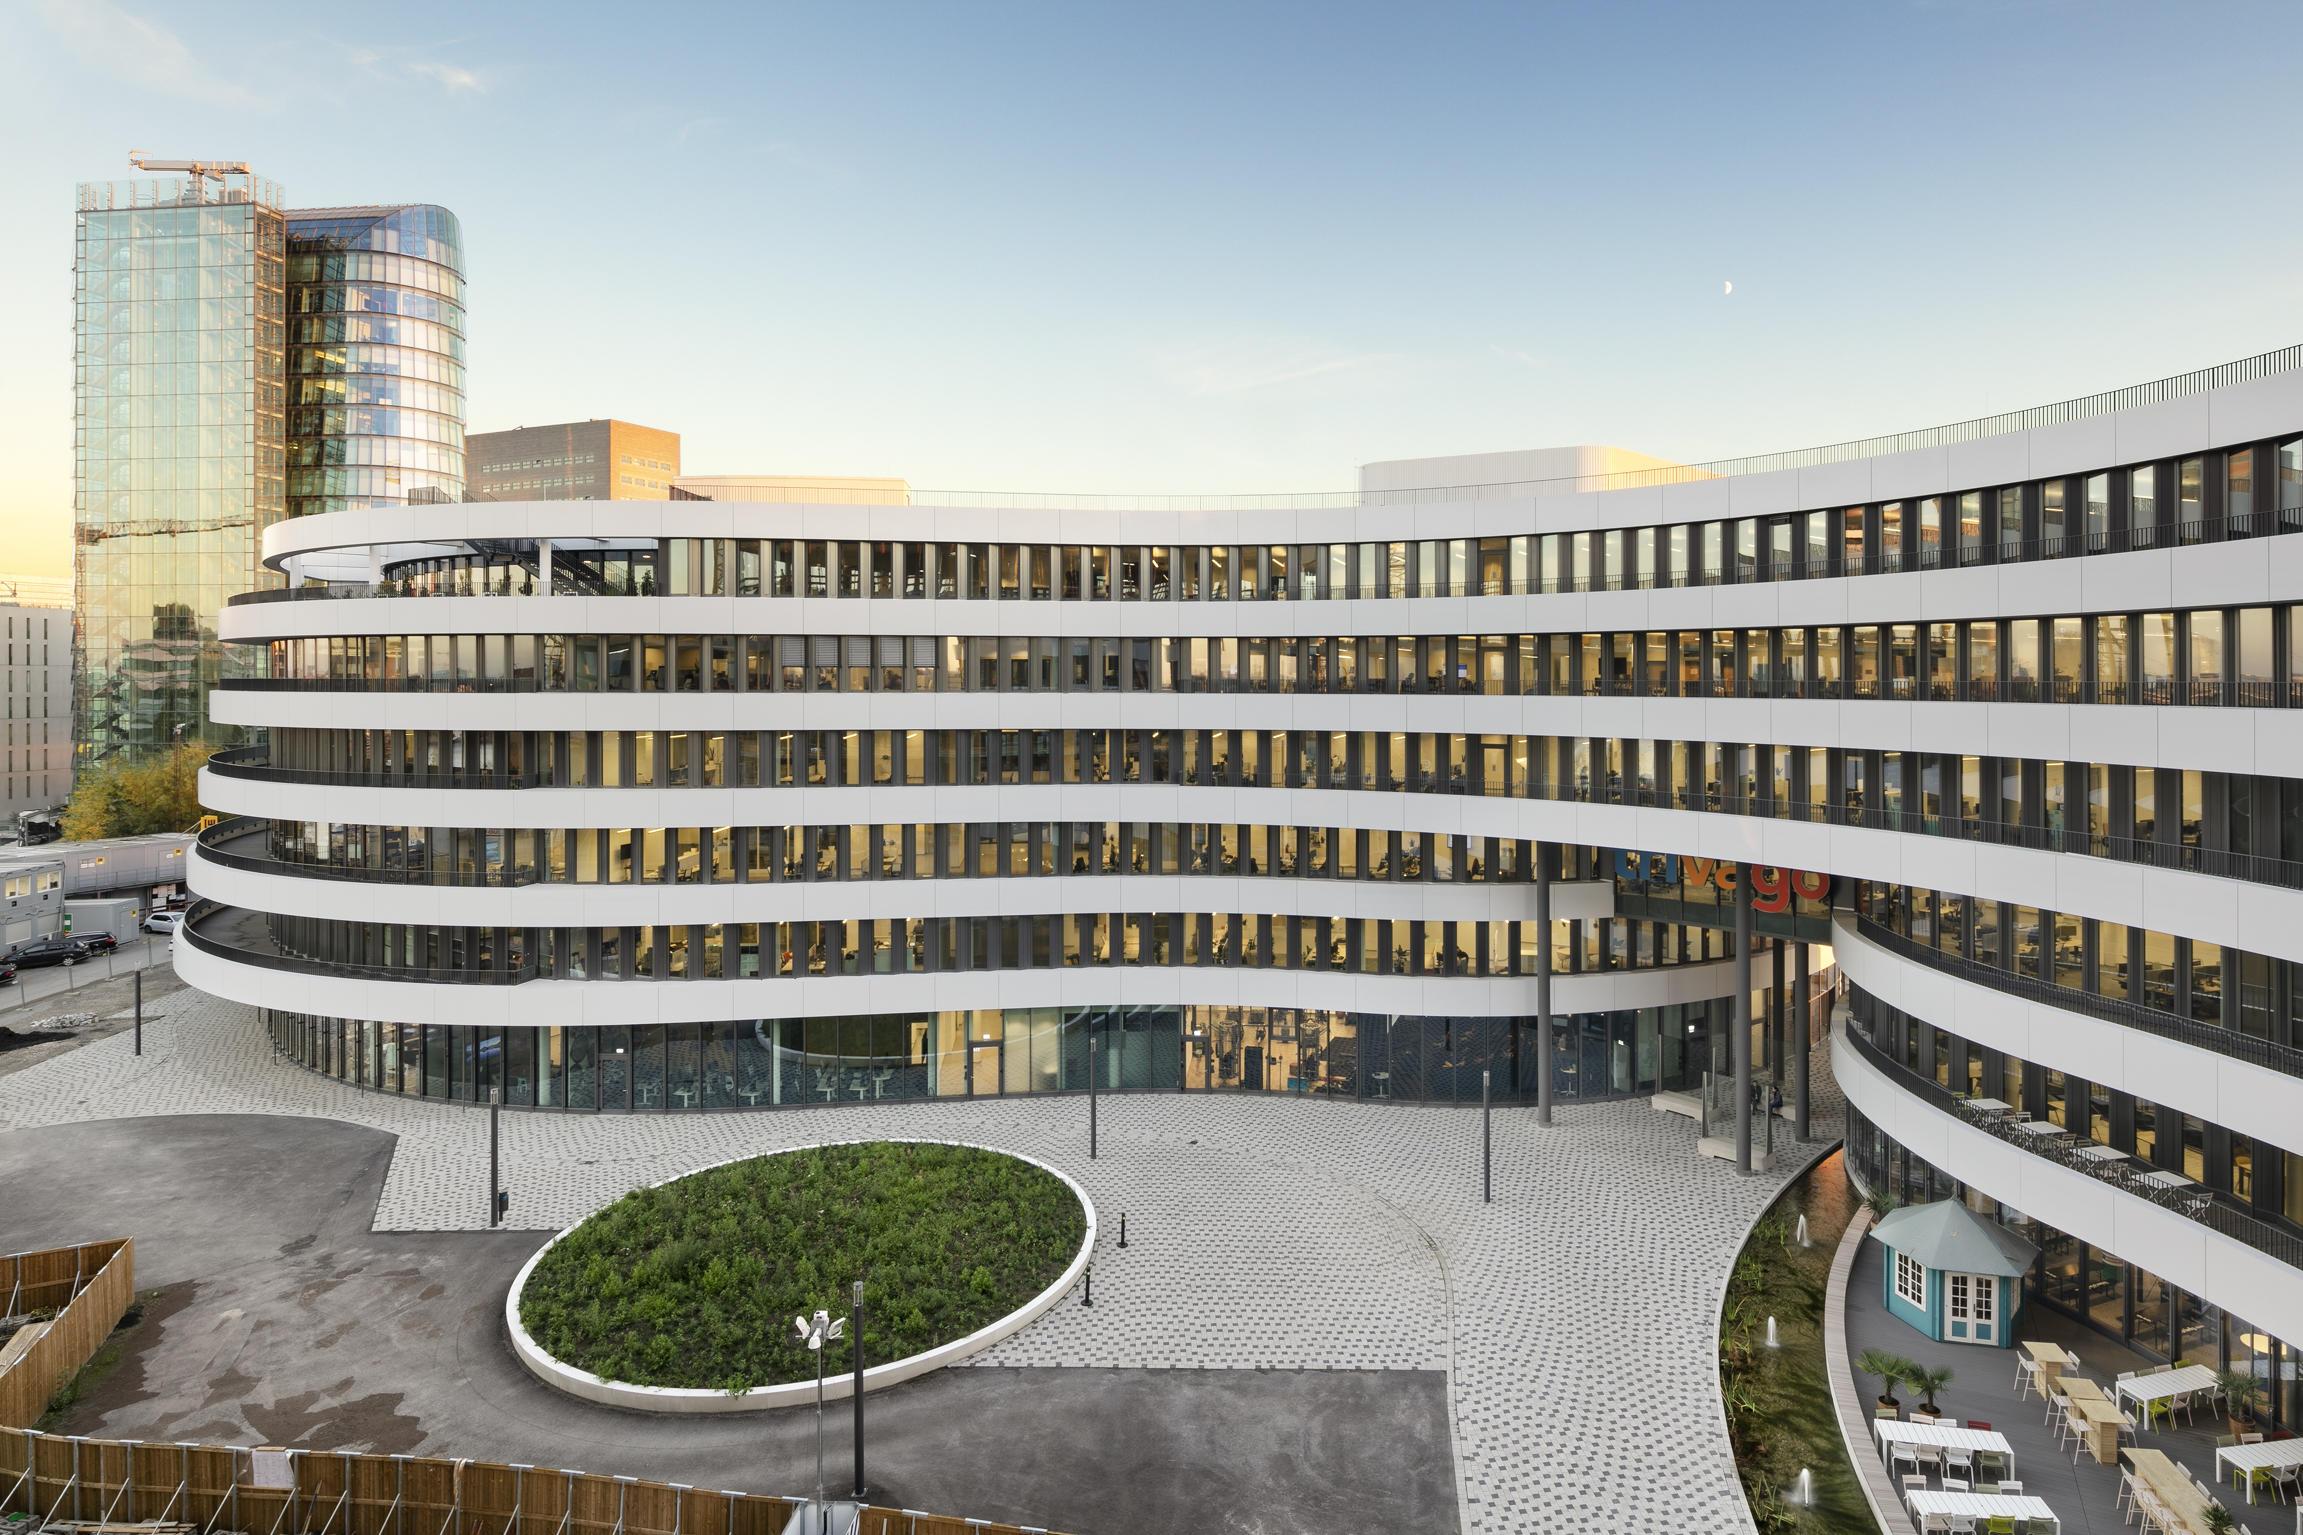 trivago headquarter d sseldorf by slapa oberholz pszczulny sop architekten office buildings